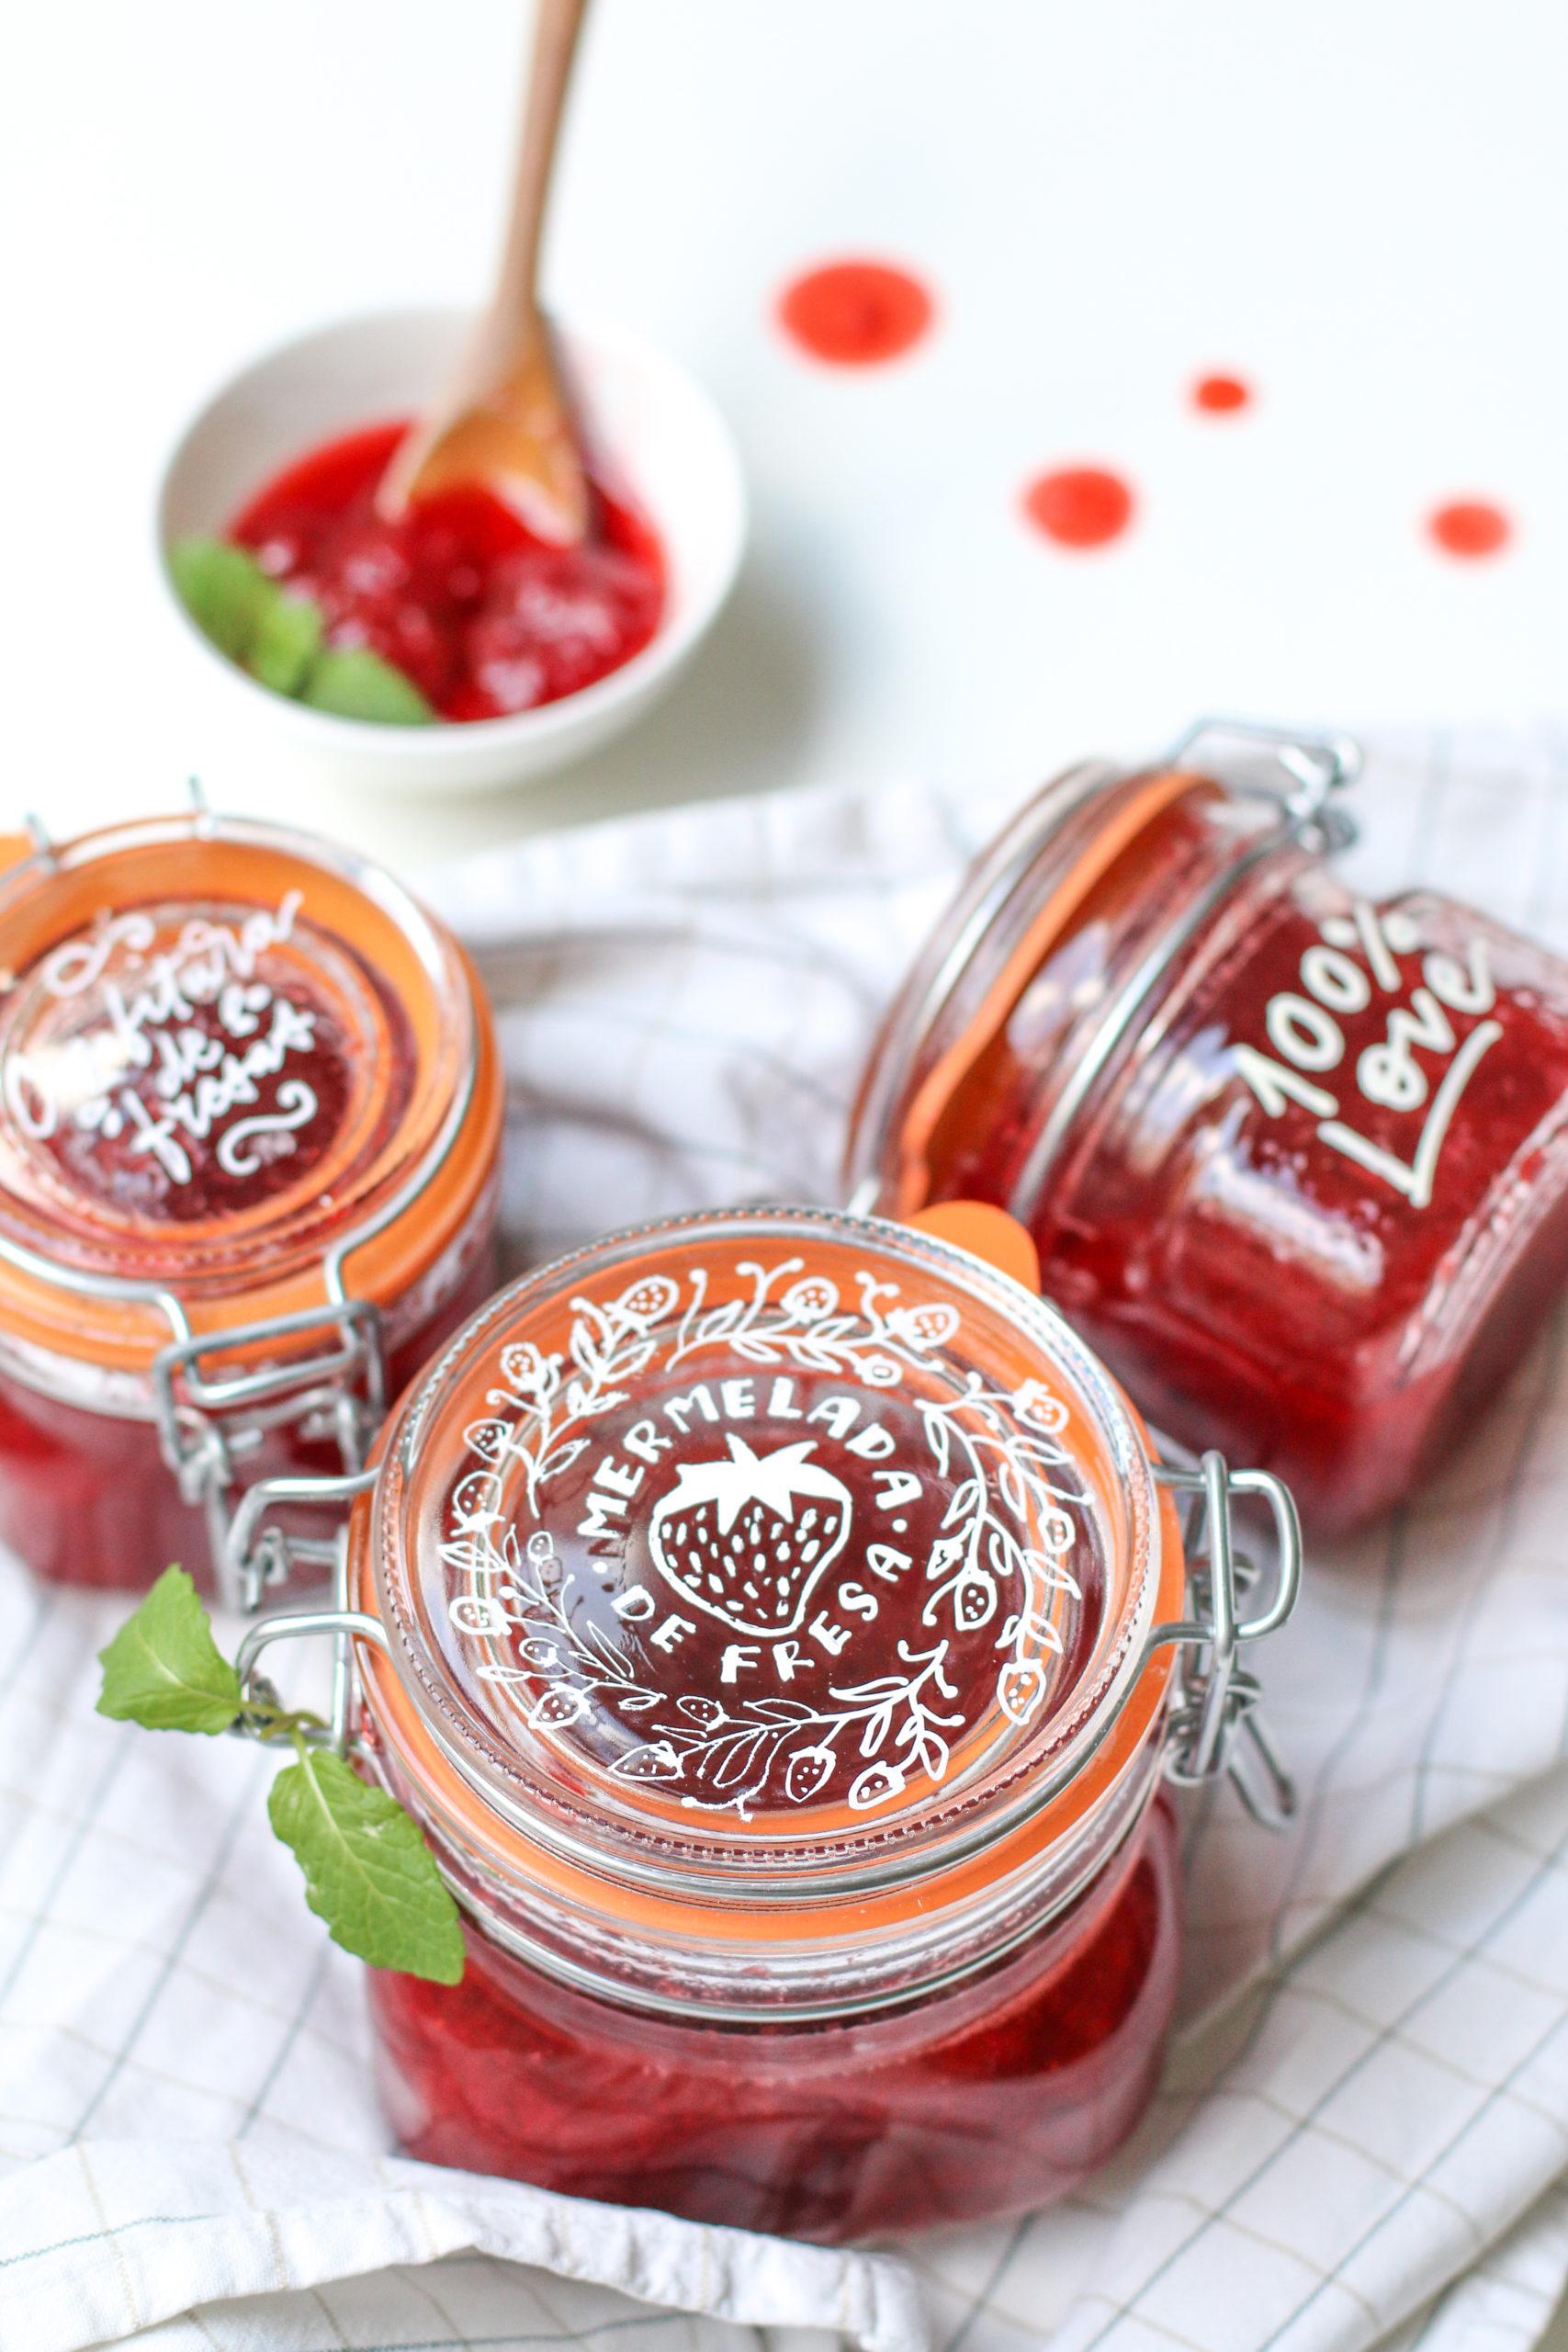 Lettering sobre cristal - Mermelada de fresa